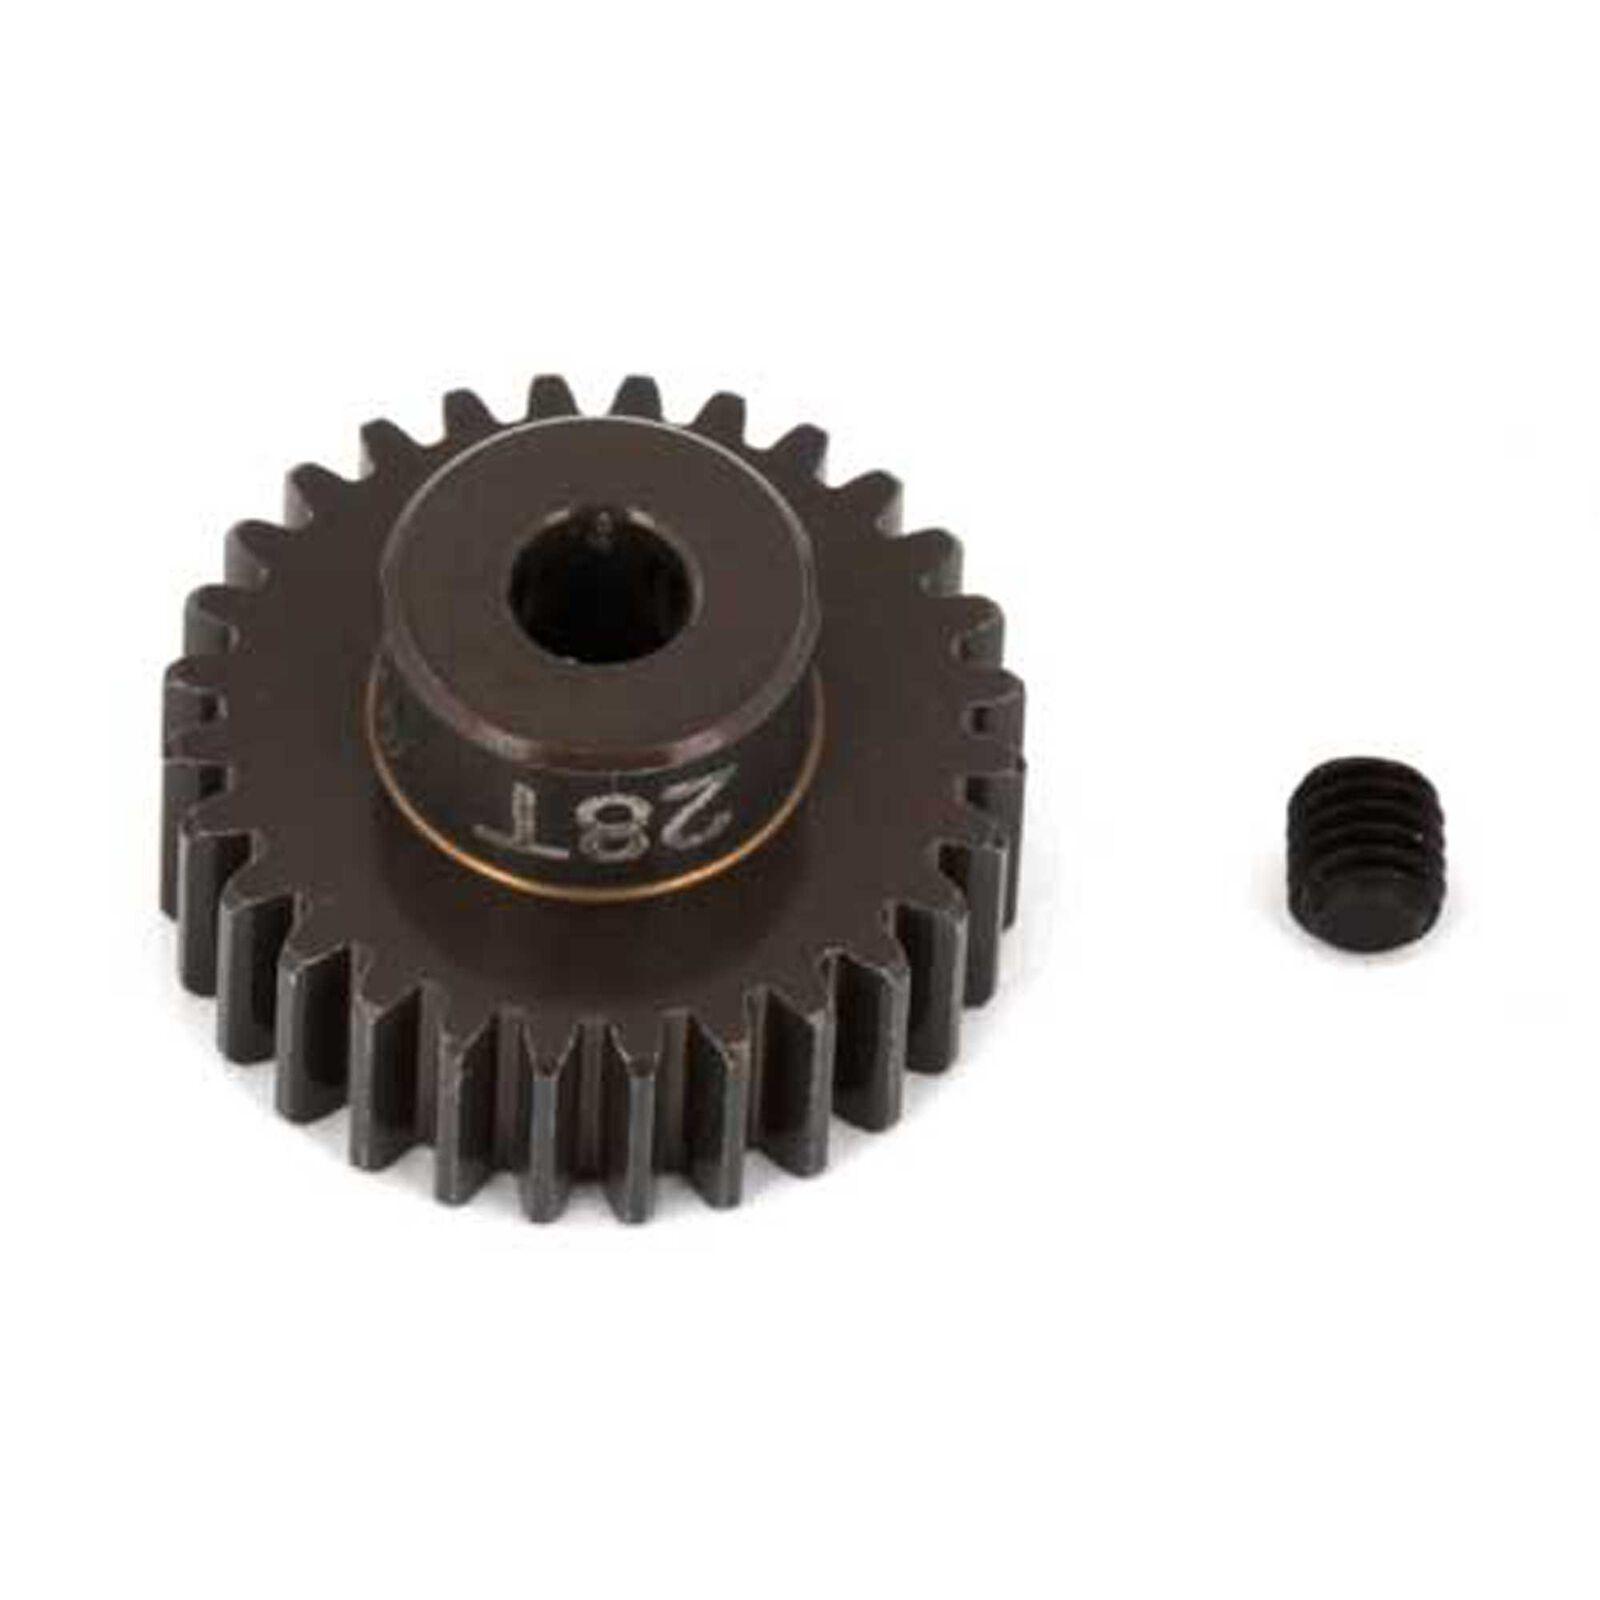 Factory Team Aluminum Pinion Gear, 28T, 48P, 1/8 shaft